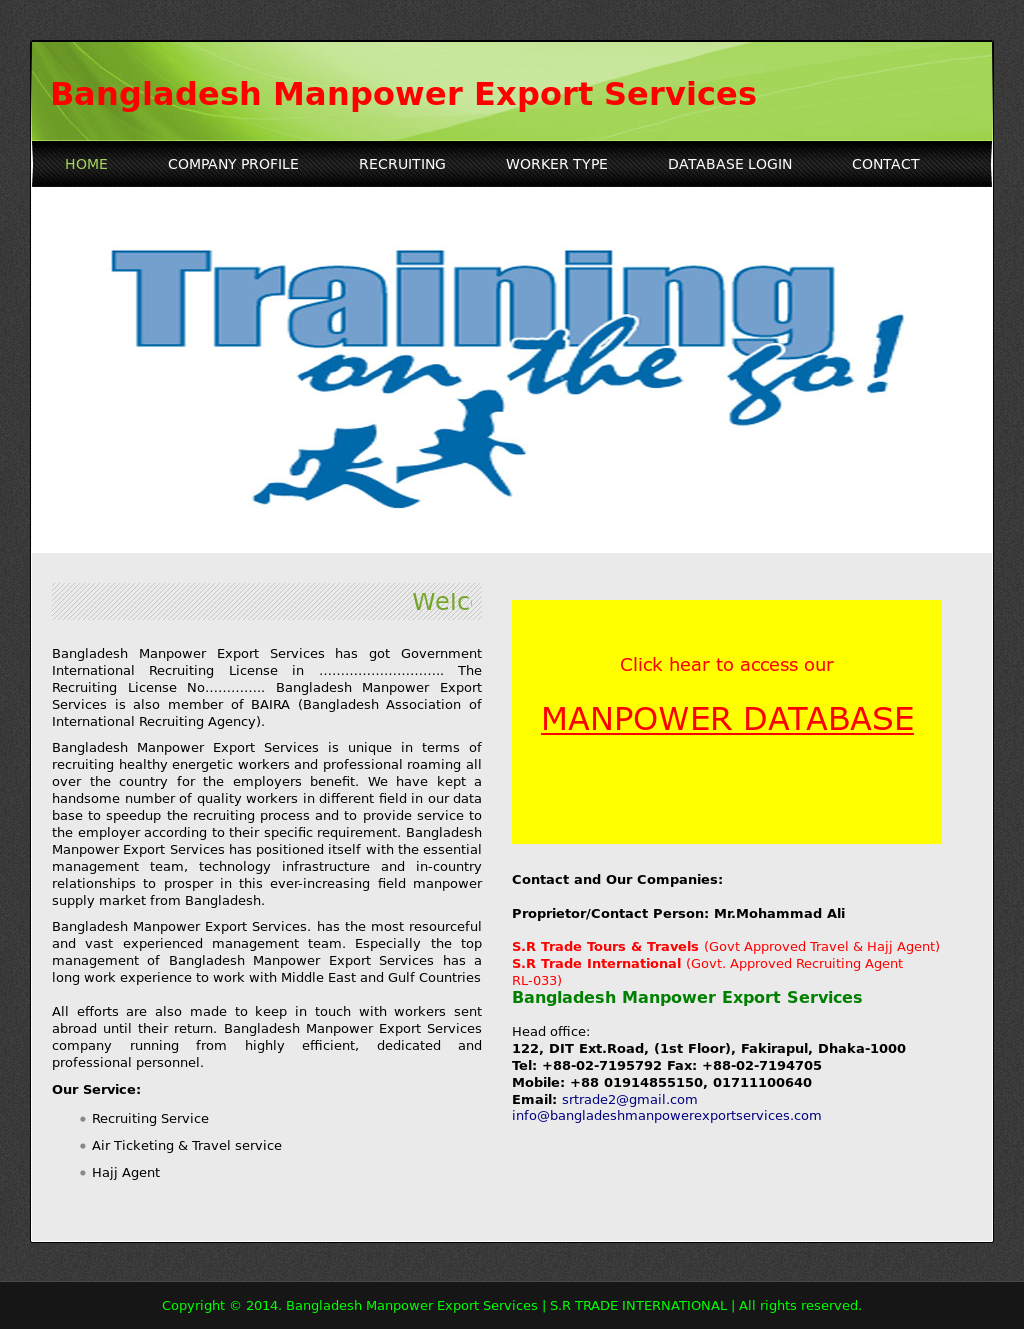 Bangladesh Manpower Export Services Competitors, Revenue and